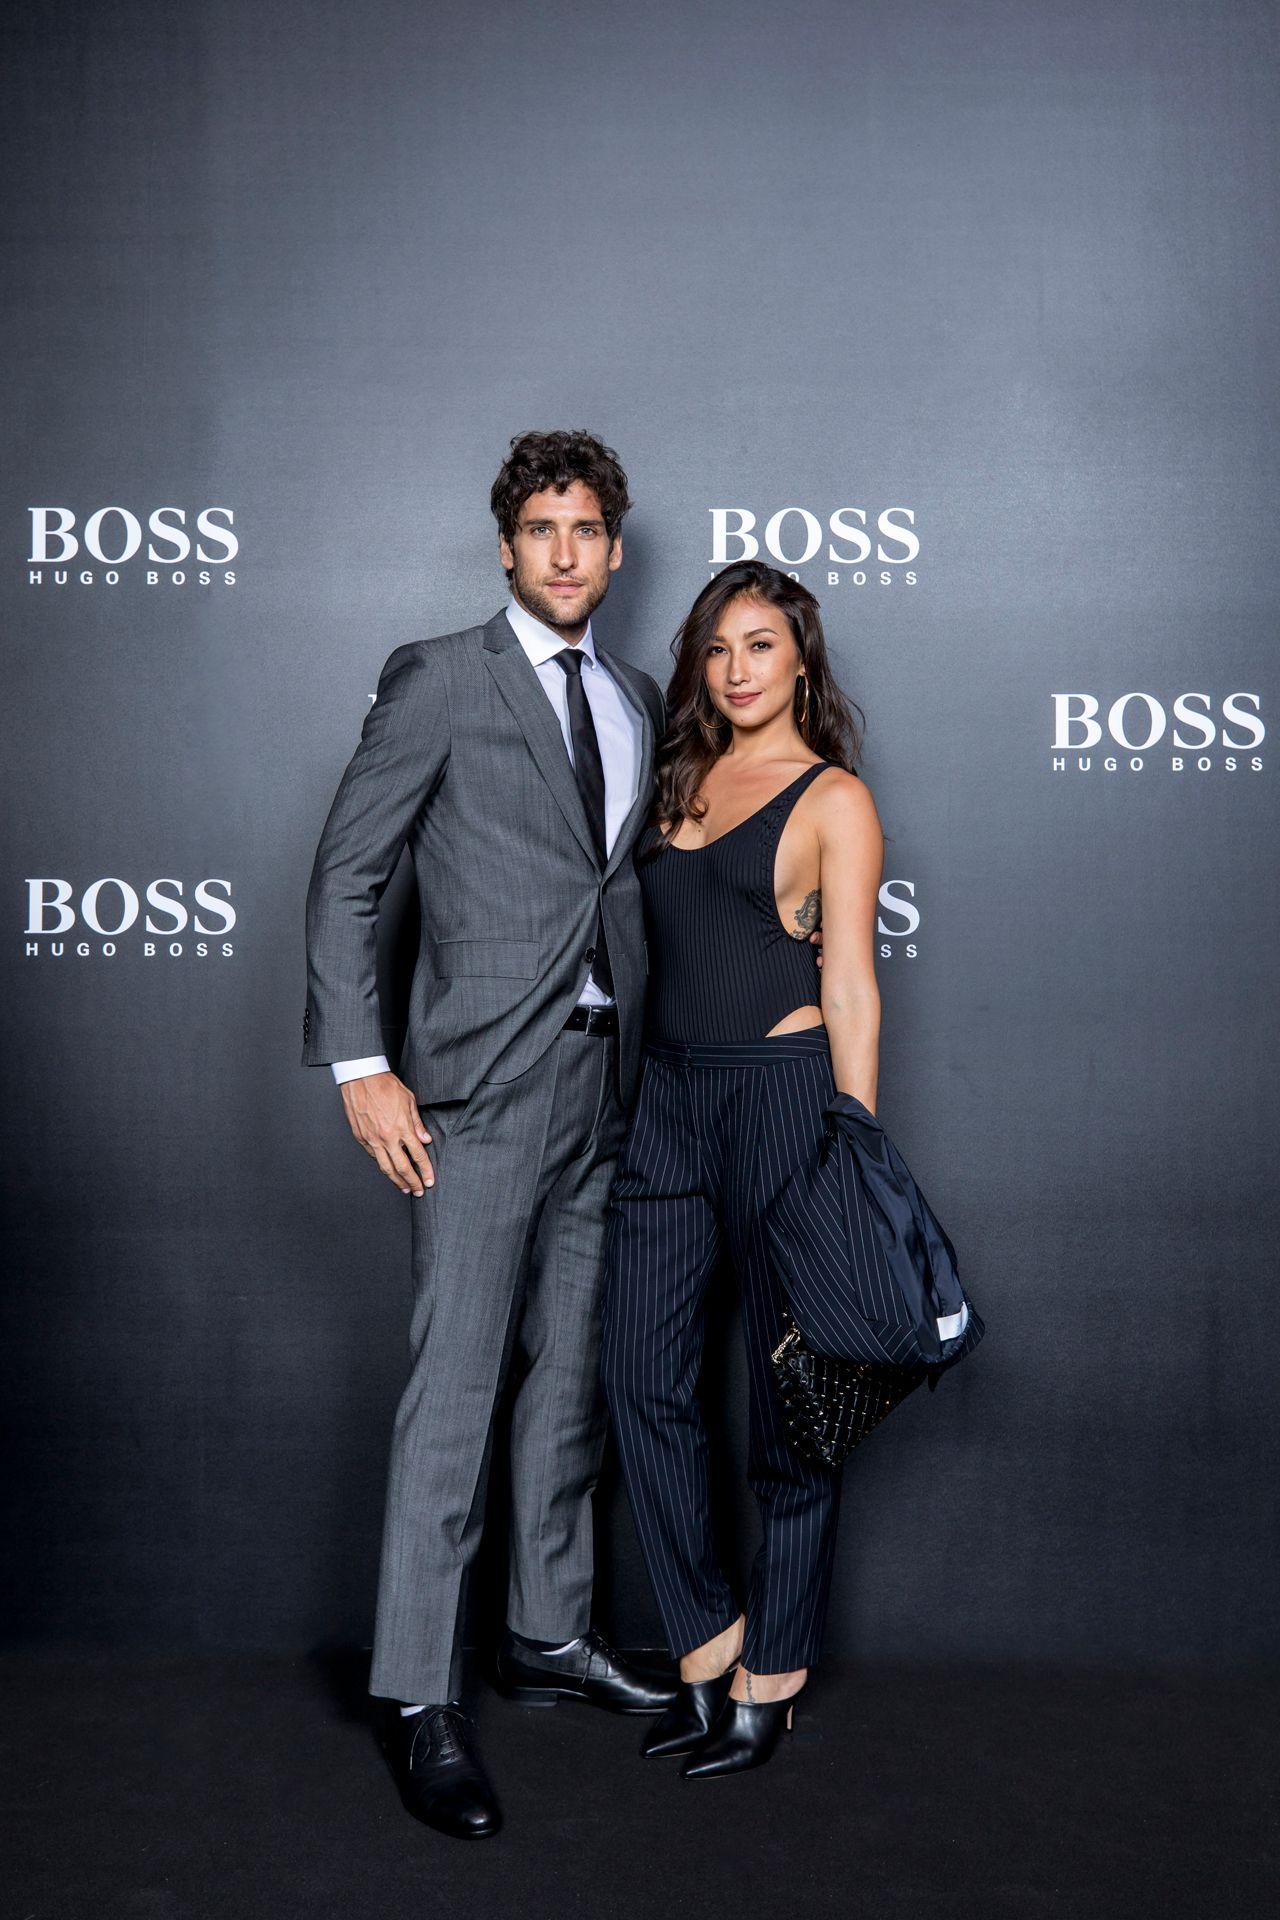 Philippine representatives Nico Bolzico and Solenn Heussaff in BOSS